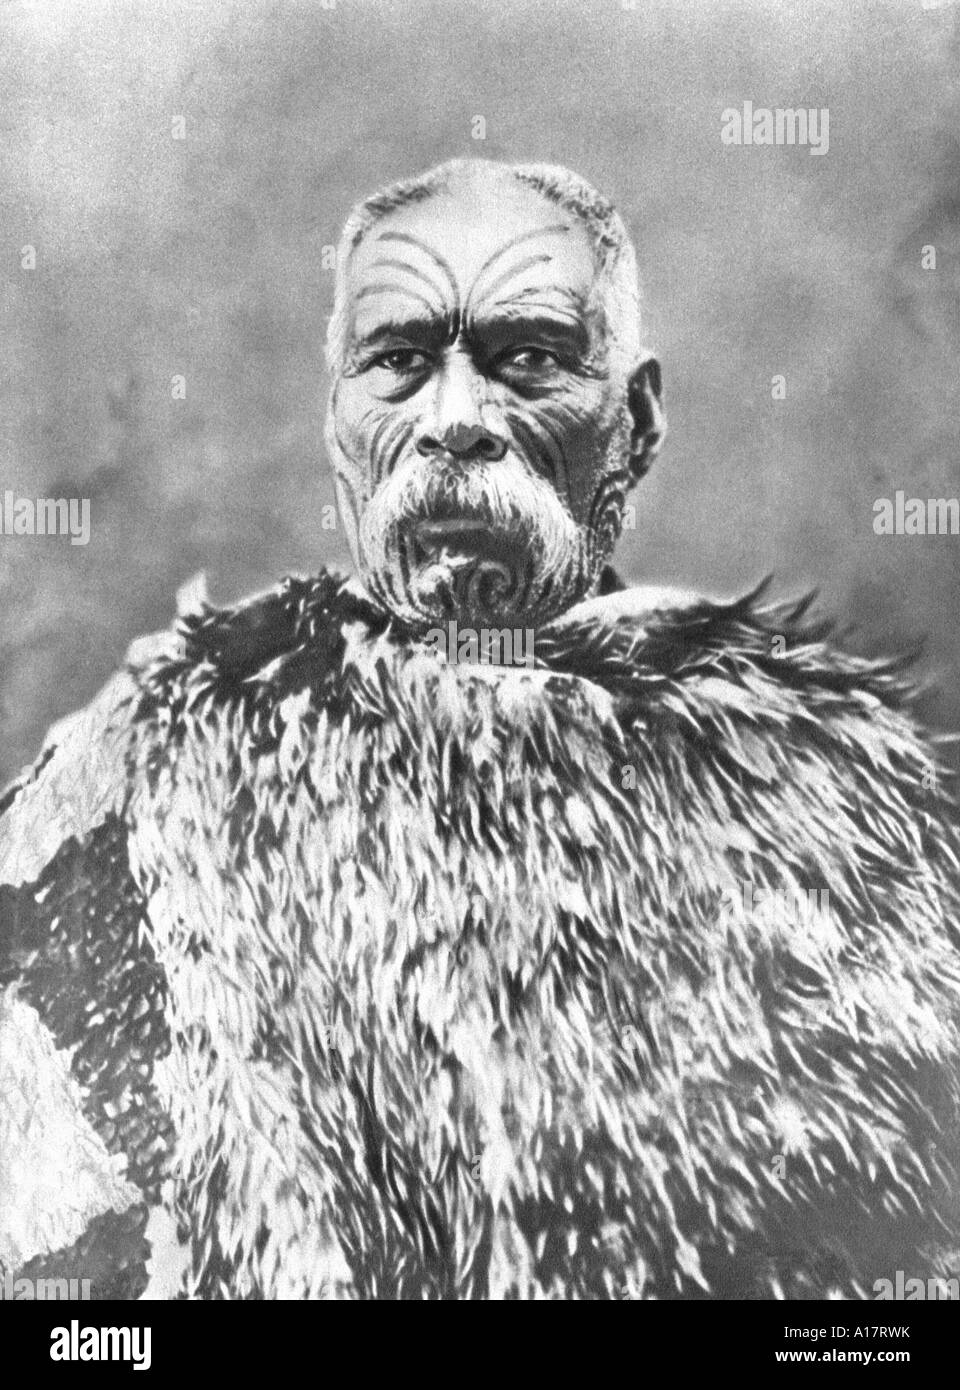 Historical Photograph of Maori Chief - Stock Image